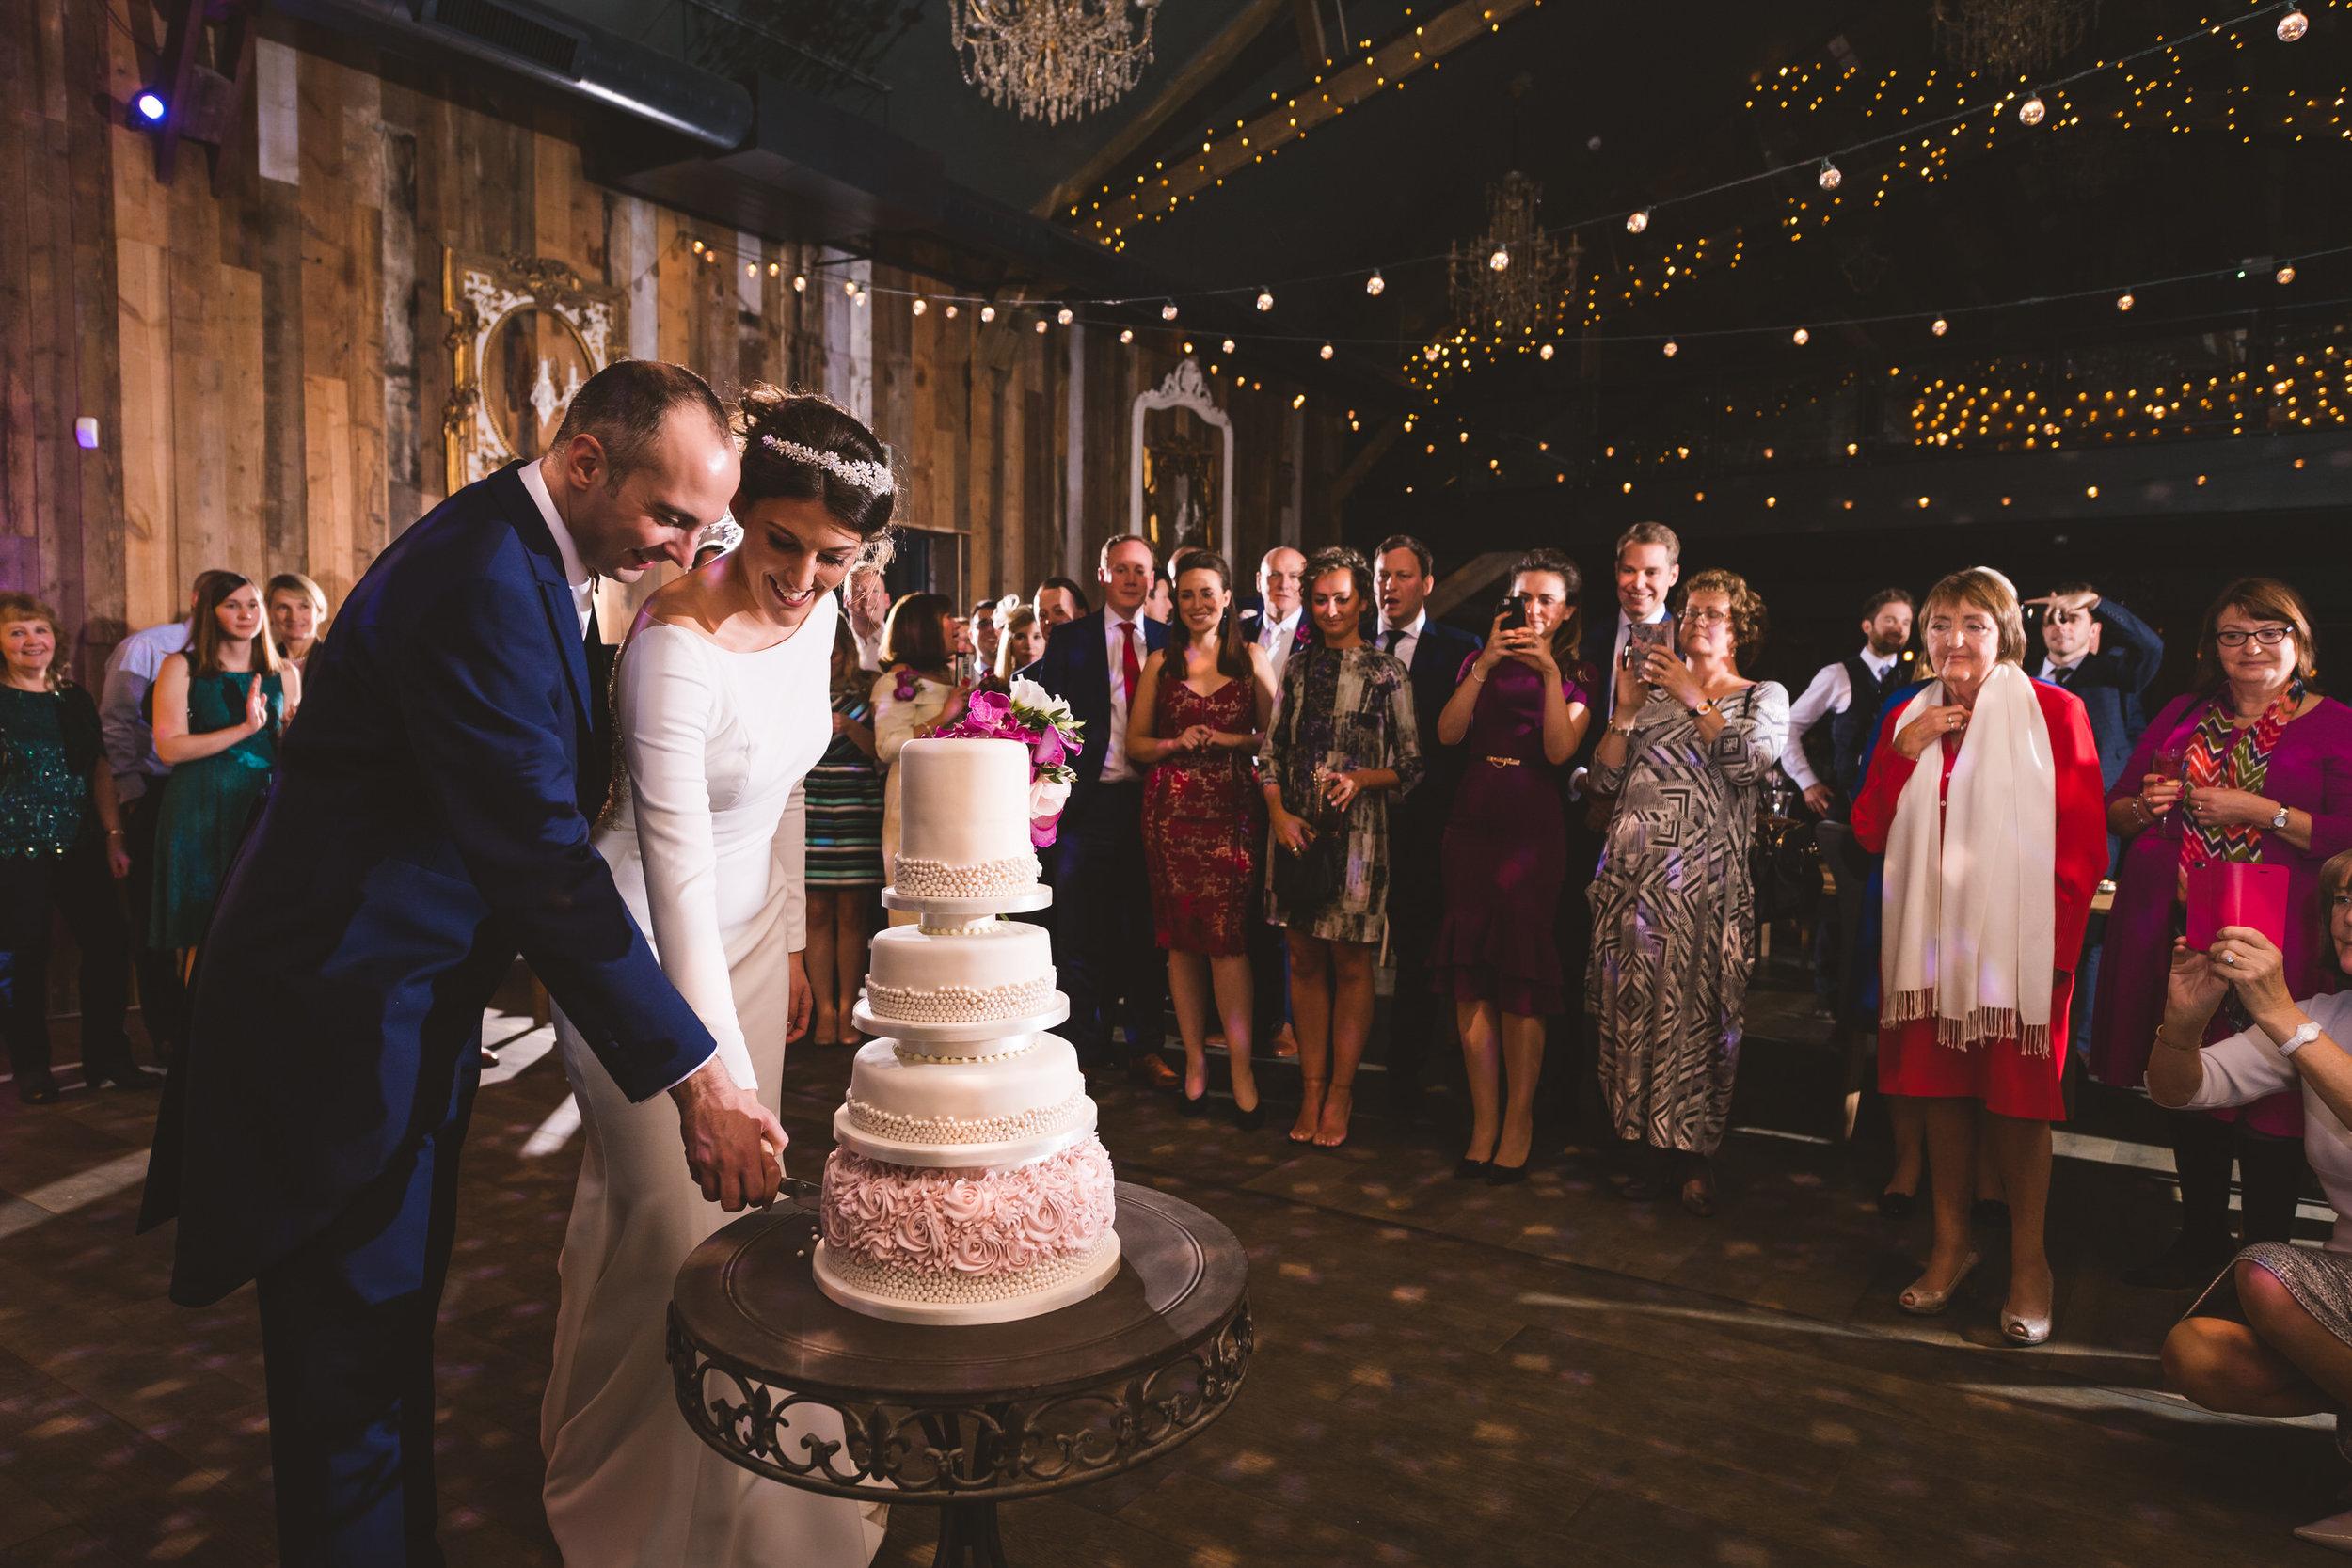 wharfedale-grange-harrogate-wedding-photographer-59.jpg